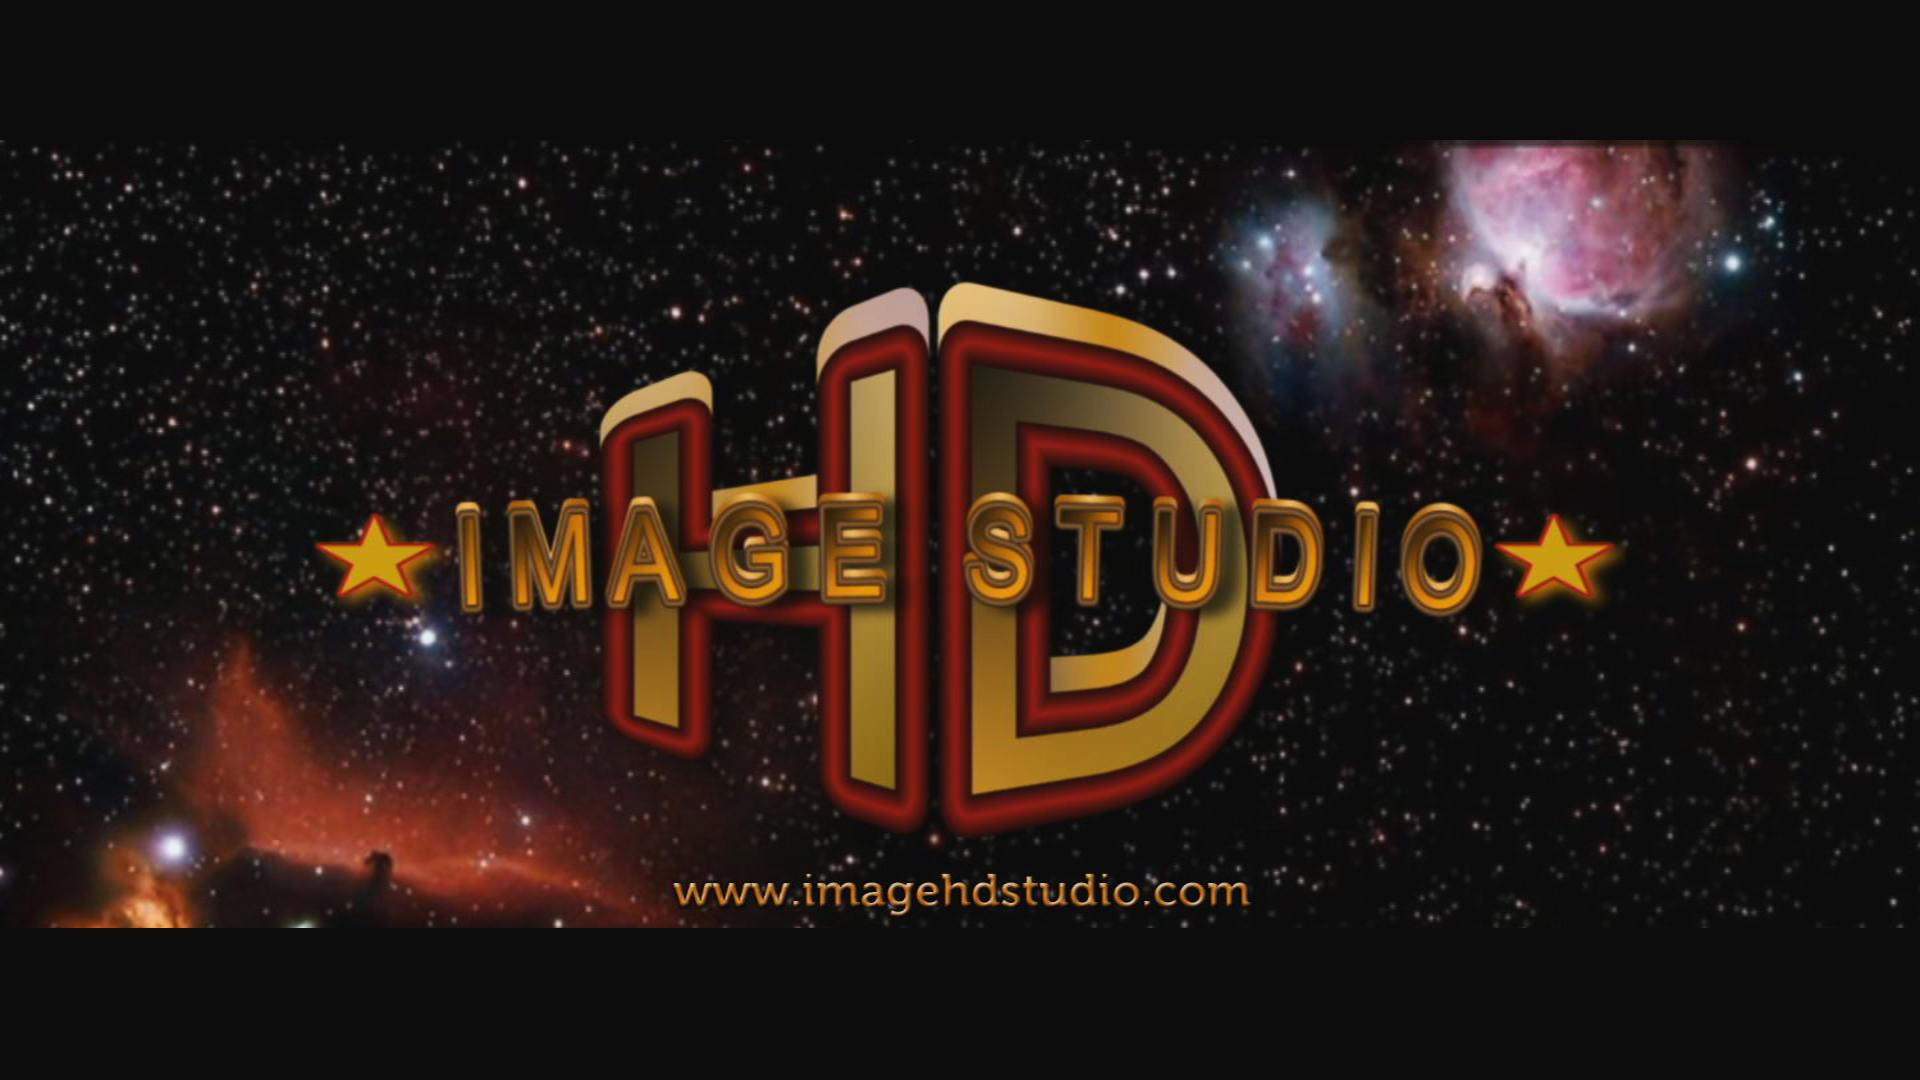 Image HD Studio logo